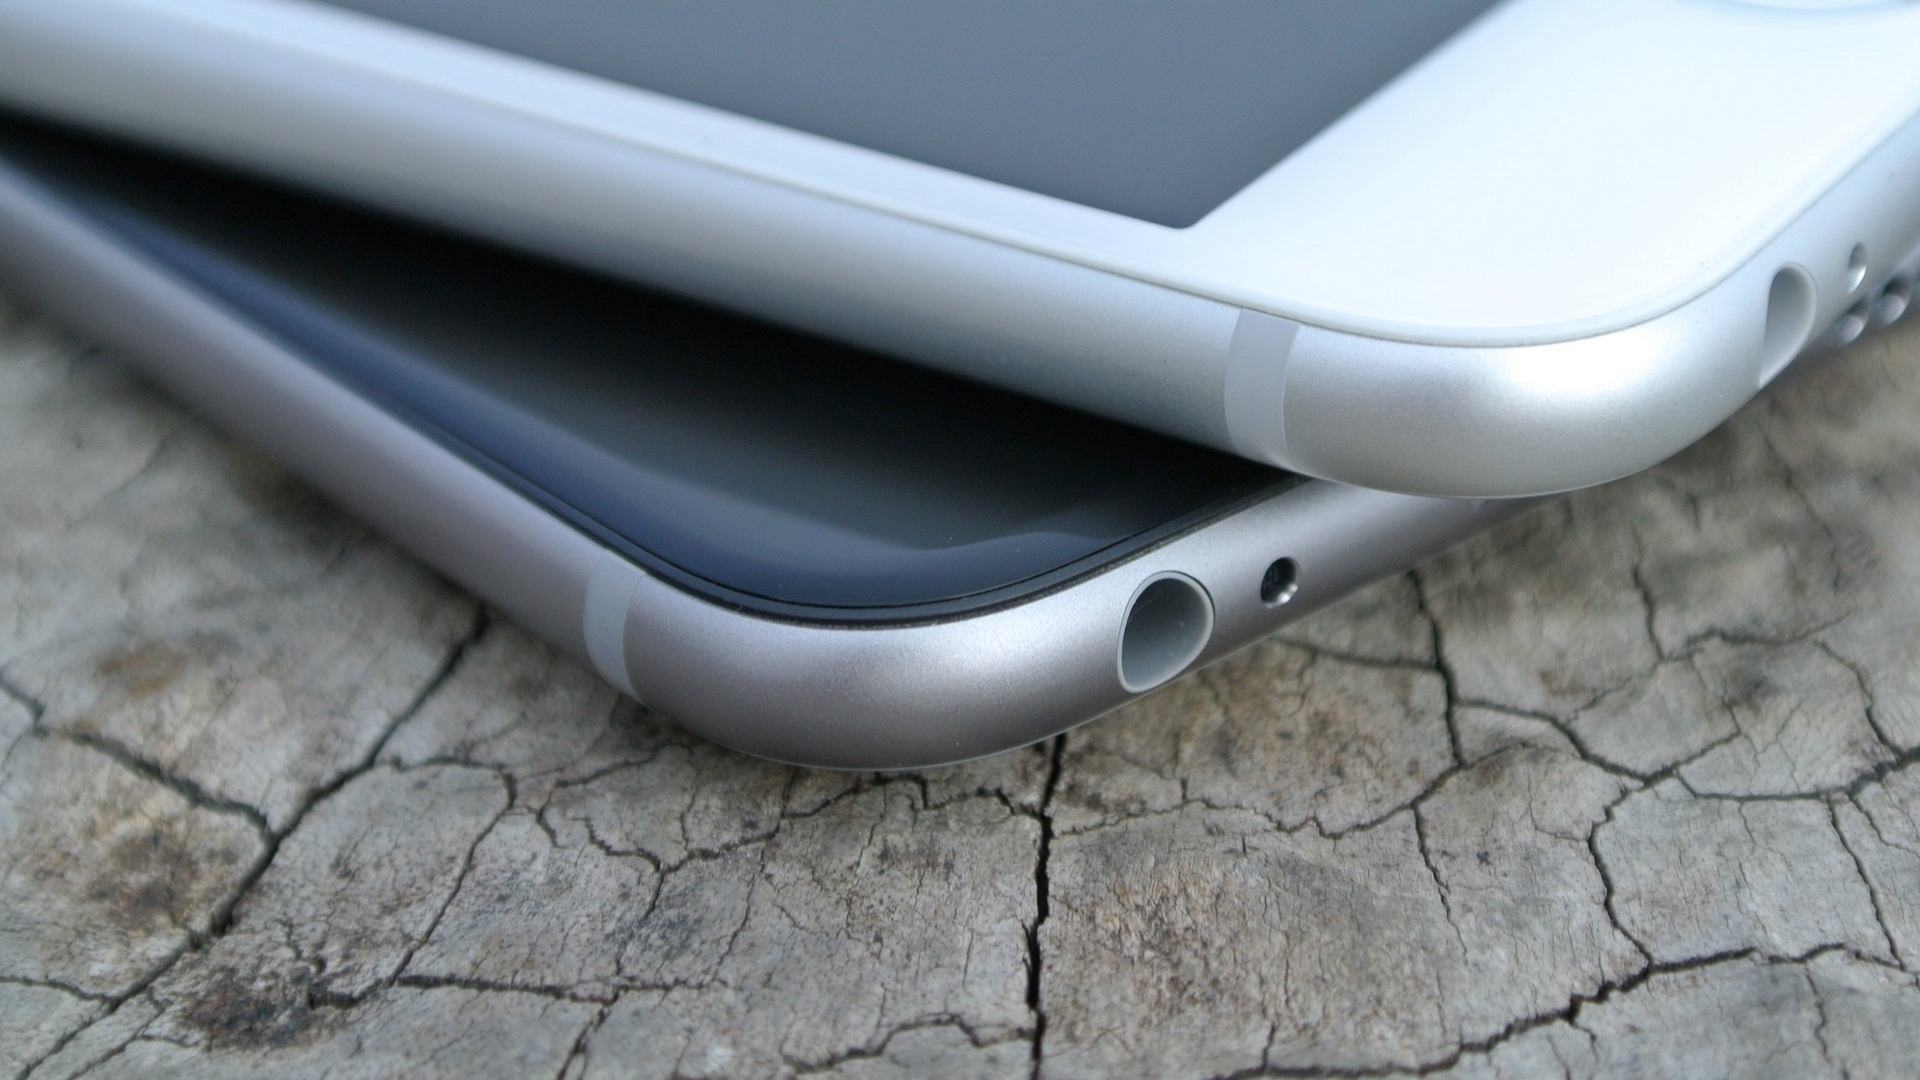 Wallpaper Iphone, Iphone 6, Apple - Germany Best Mobile Phone - HD Wallpaper